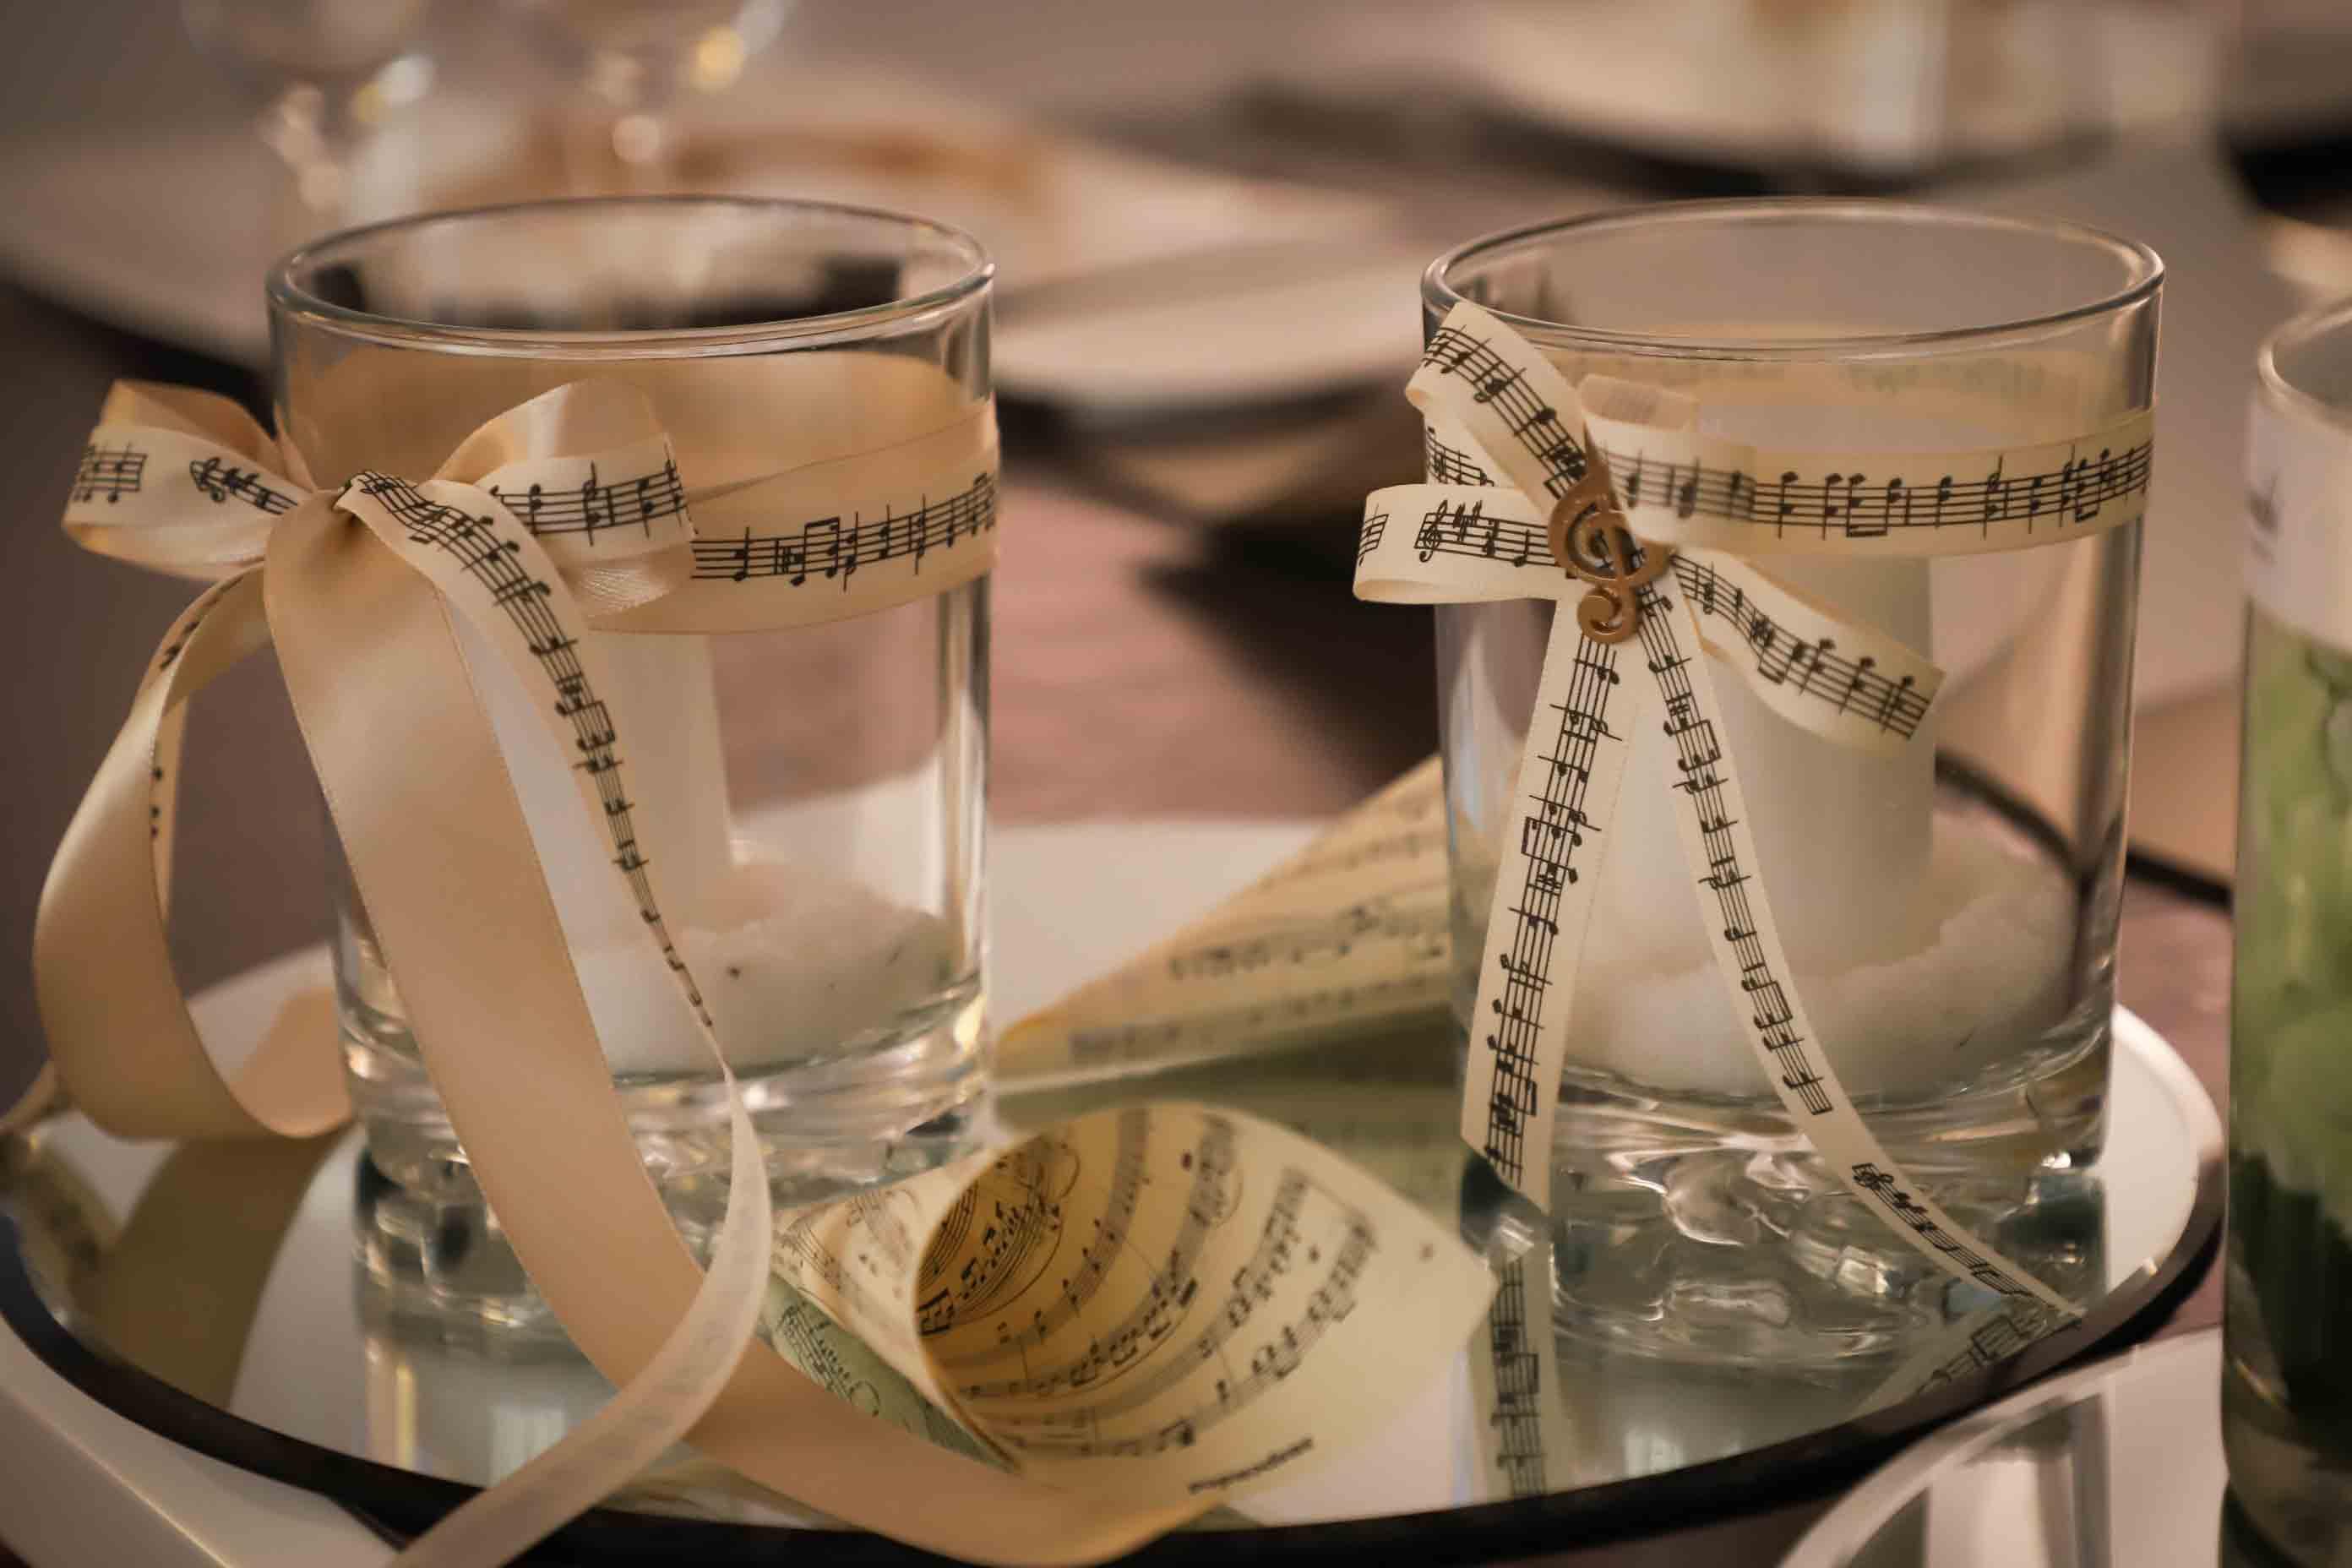 Idee Bomboniere Matrimonio Utili.Bomboniere Matrimonio 2018 5 Idee Originali E Utili